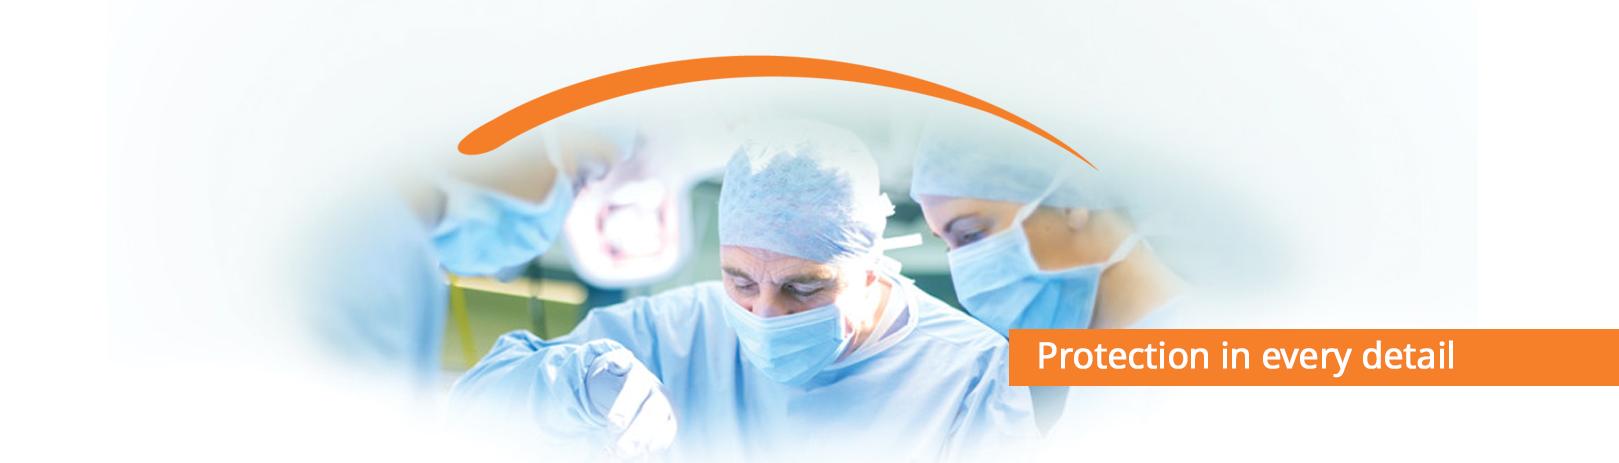 Surgery1200-1024x463